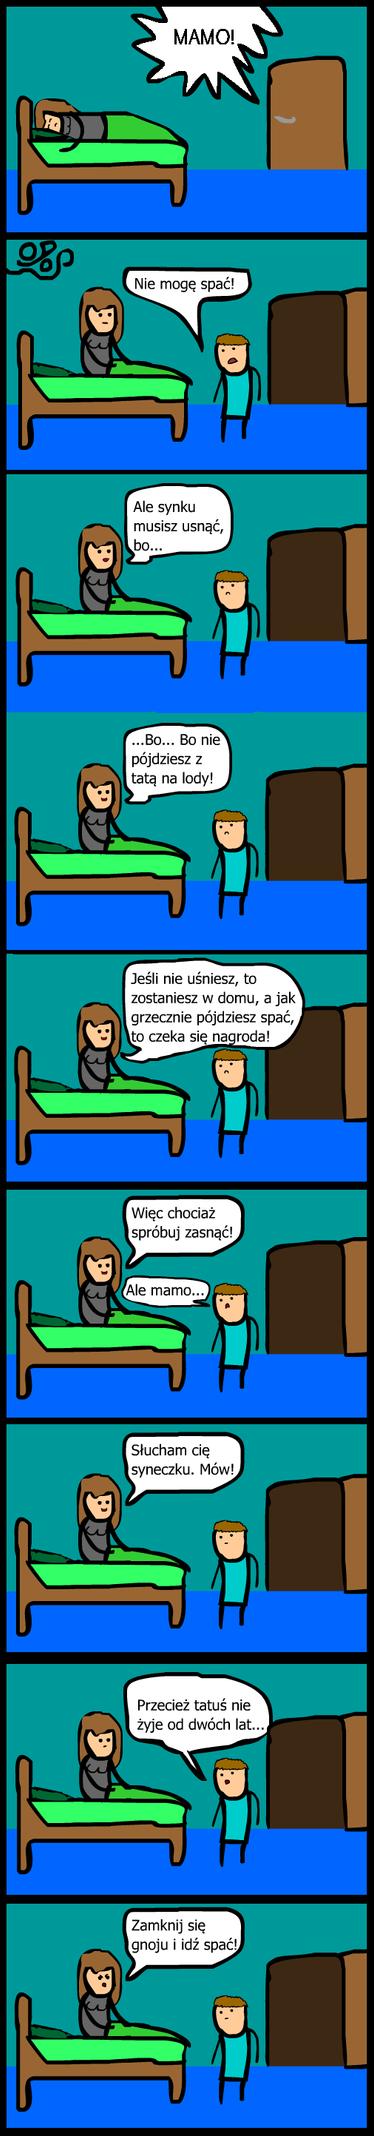 Matka i Syn 1/2-Piasek komiks nr. 94 by Norxxq